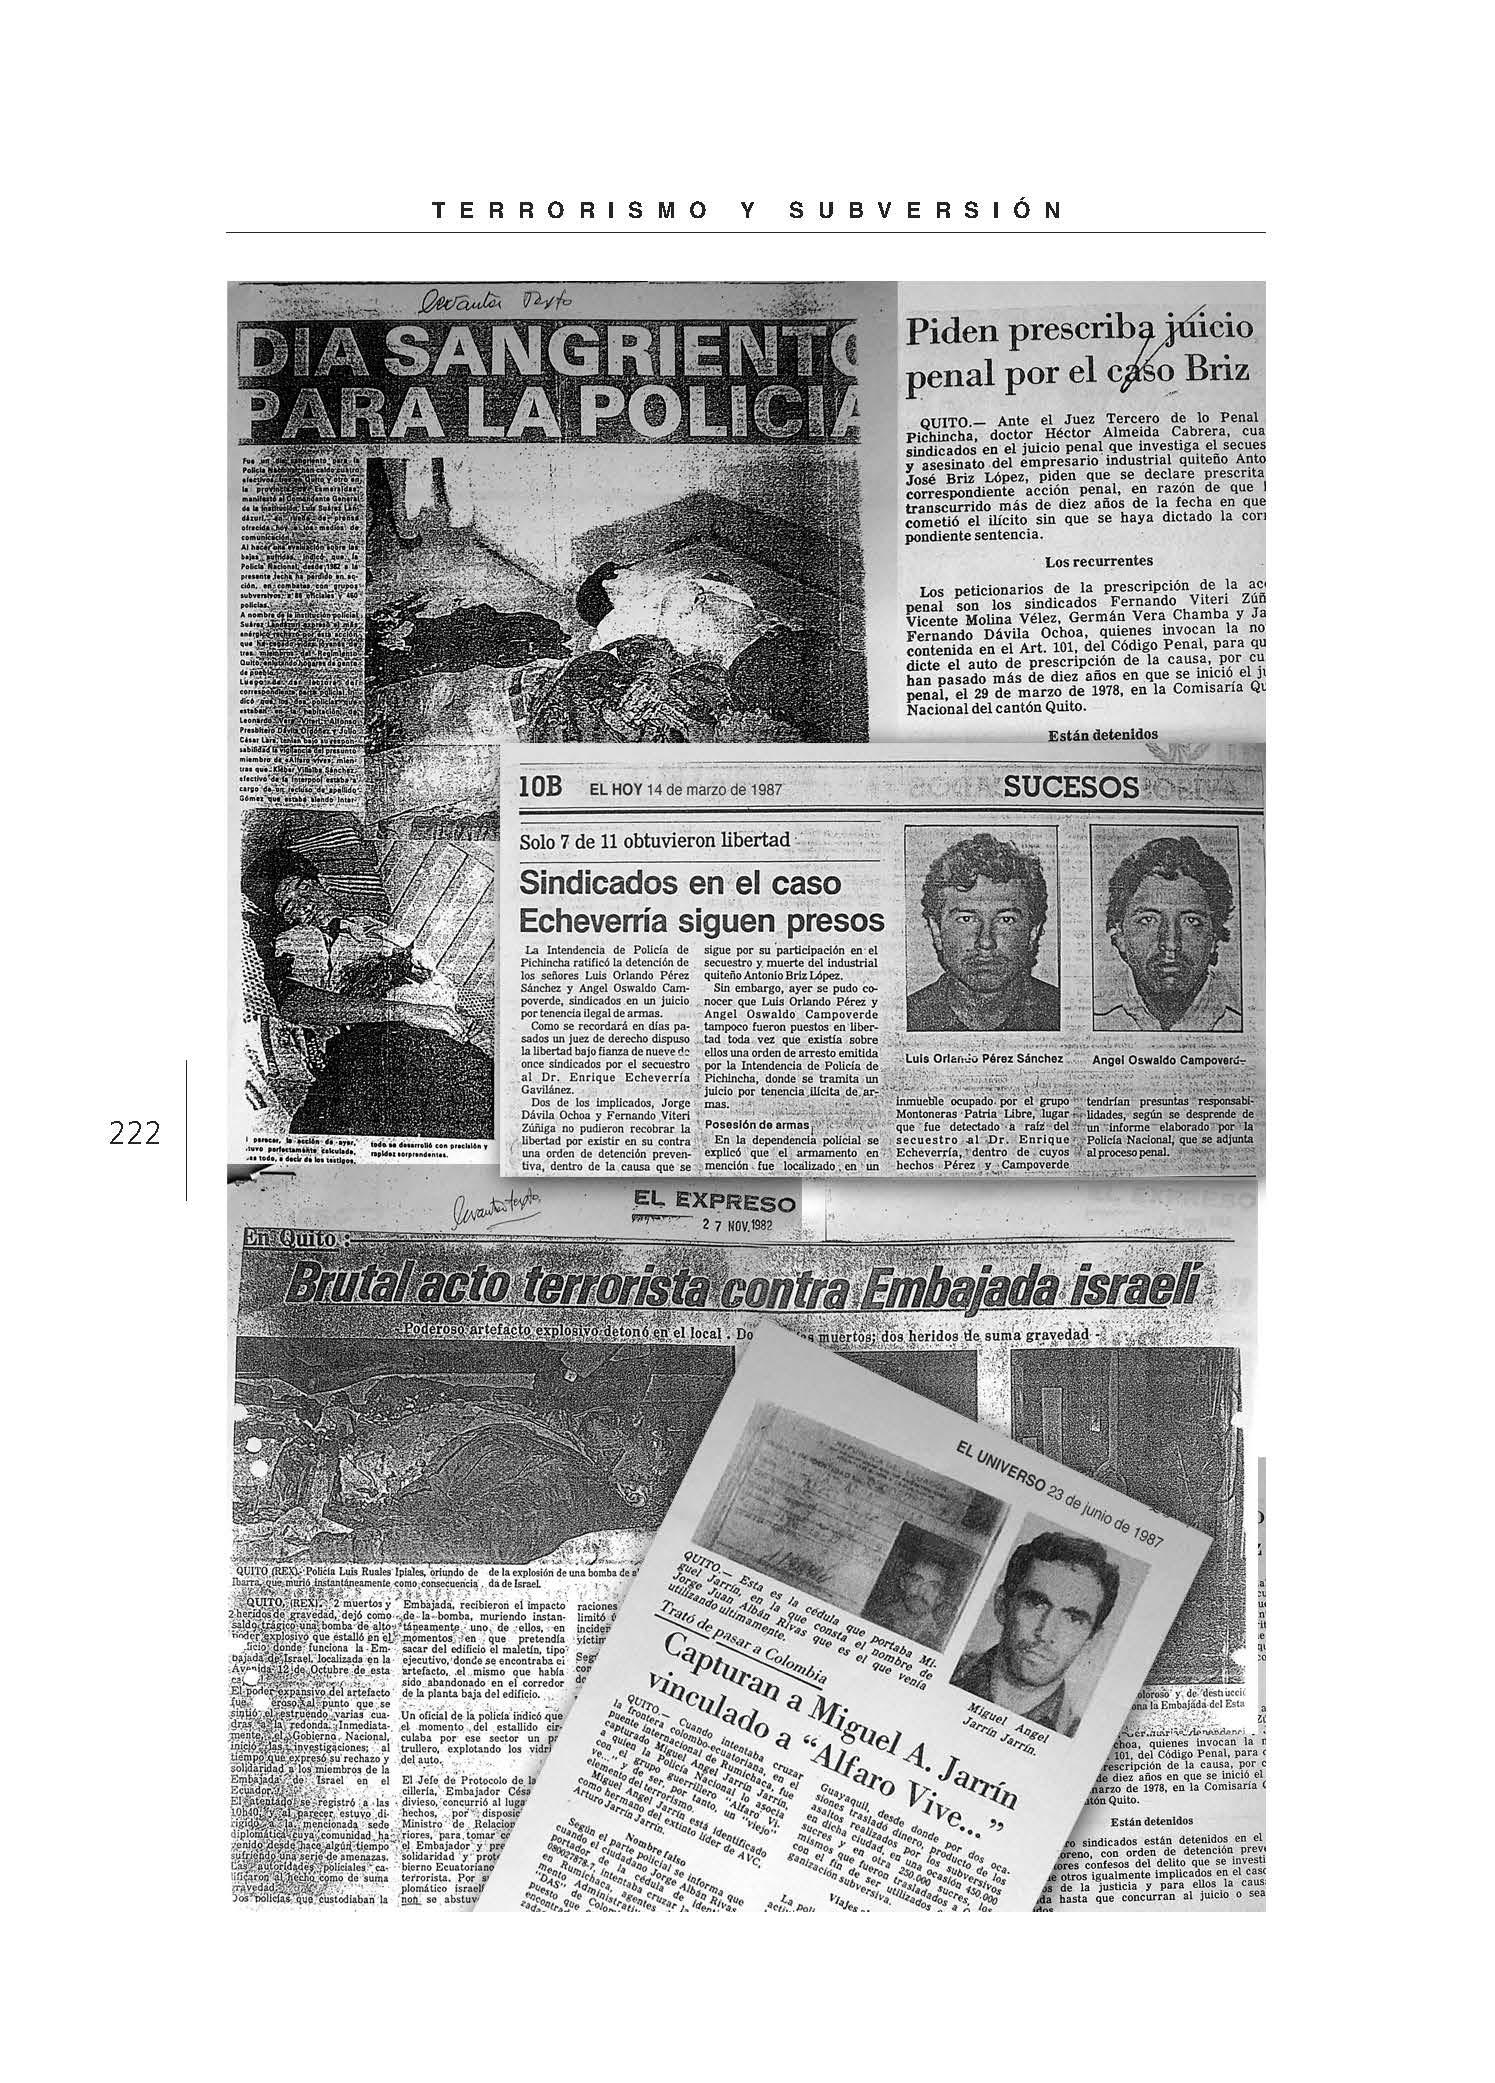 TERRORISMOYSUBVERSIONfotos_Page_05